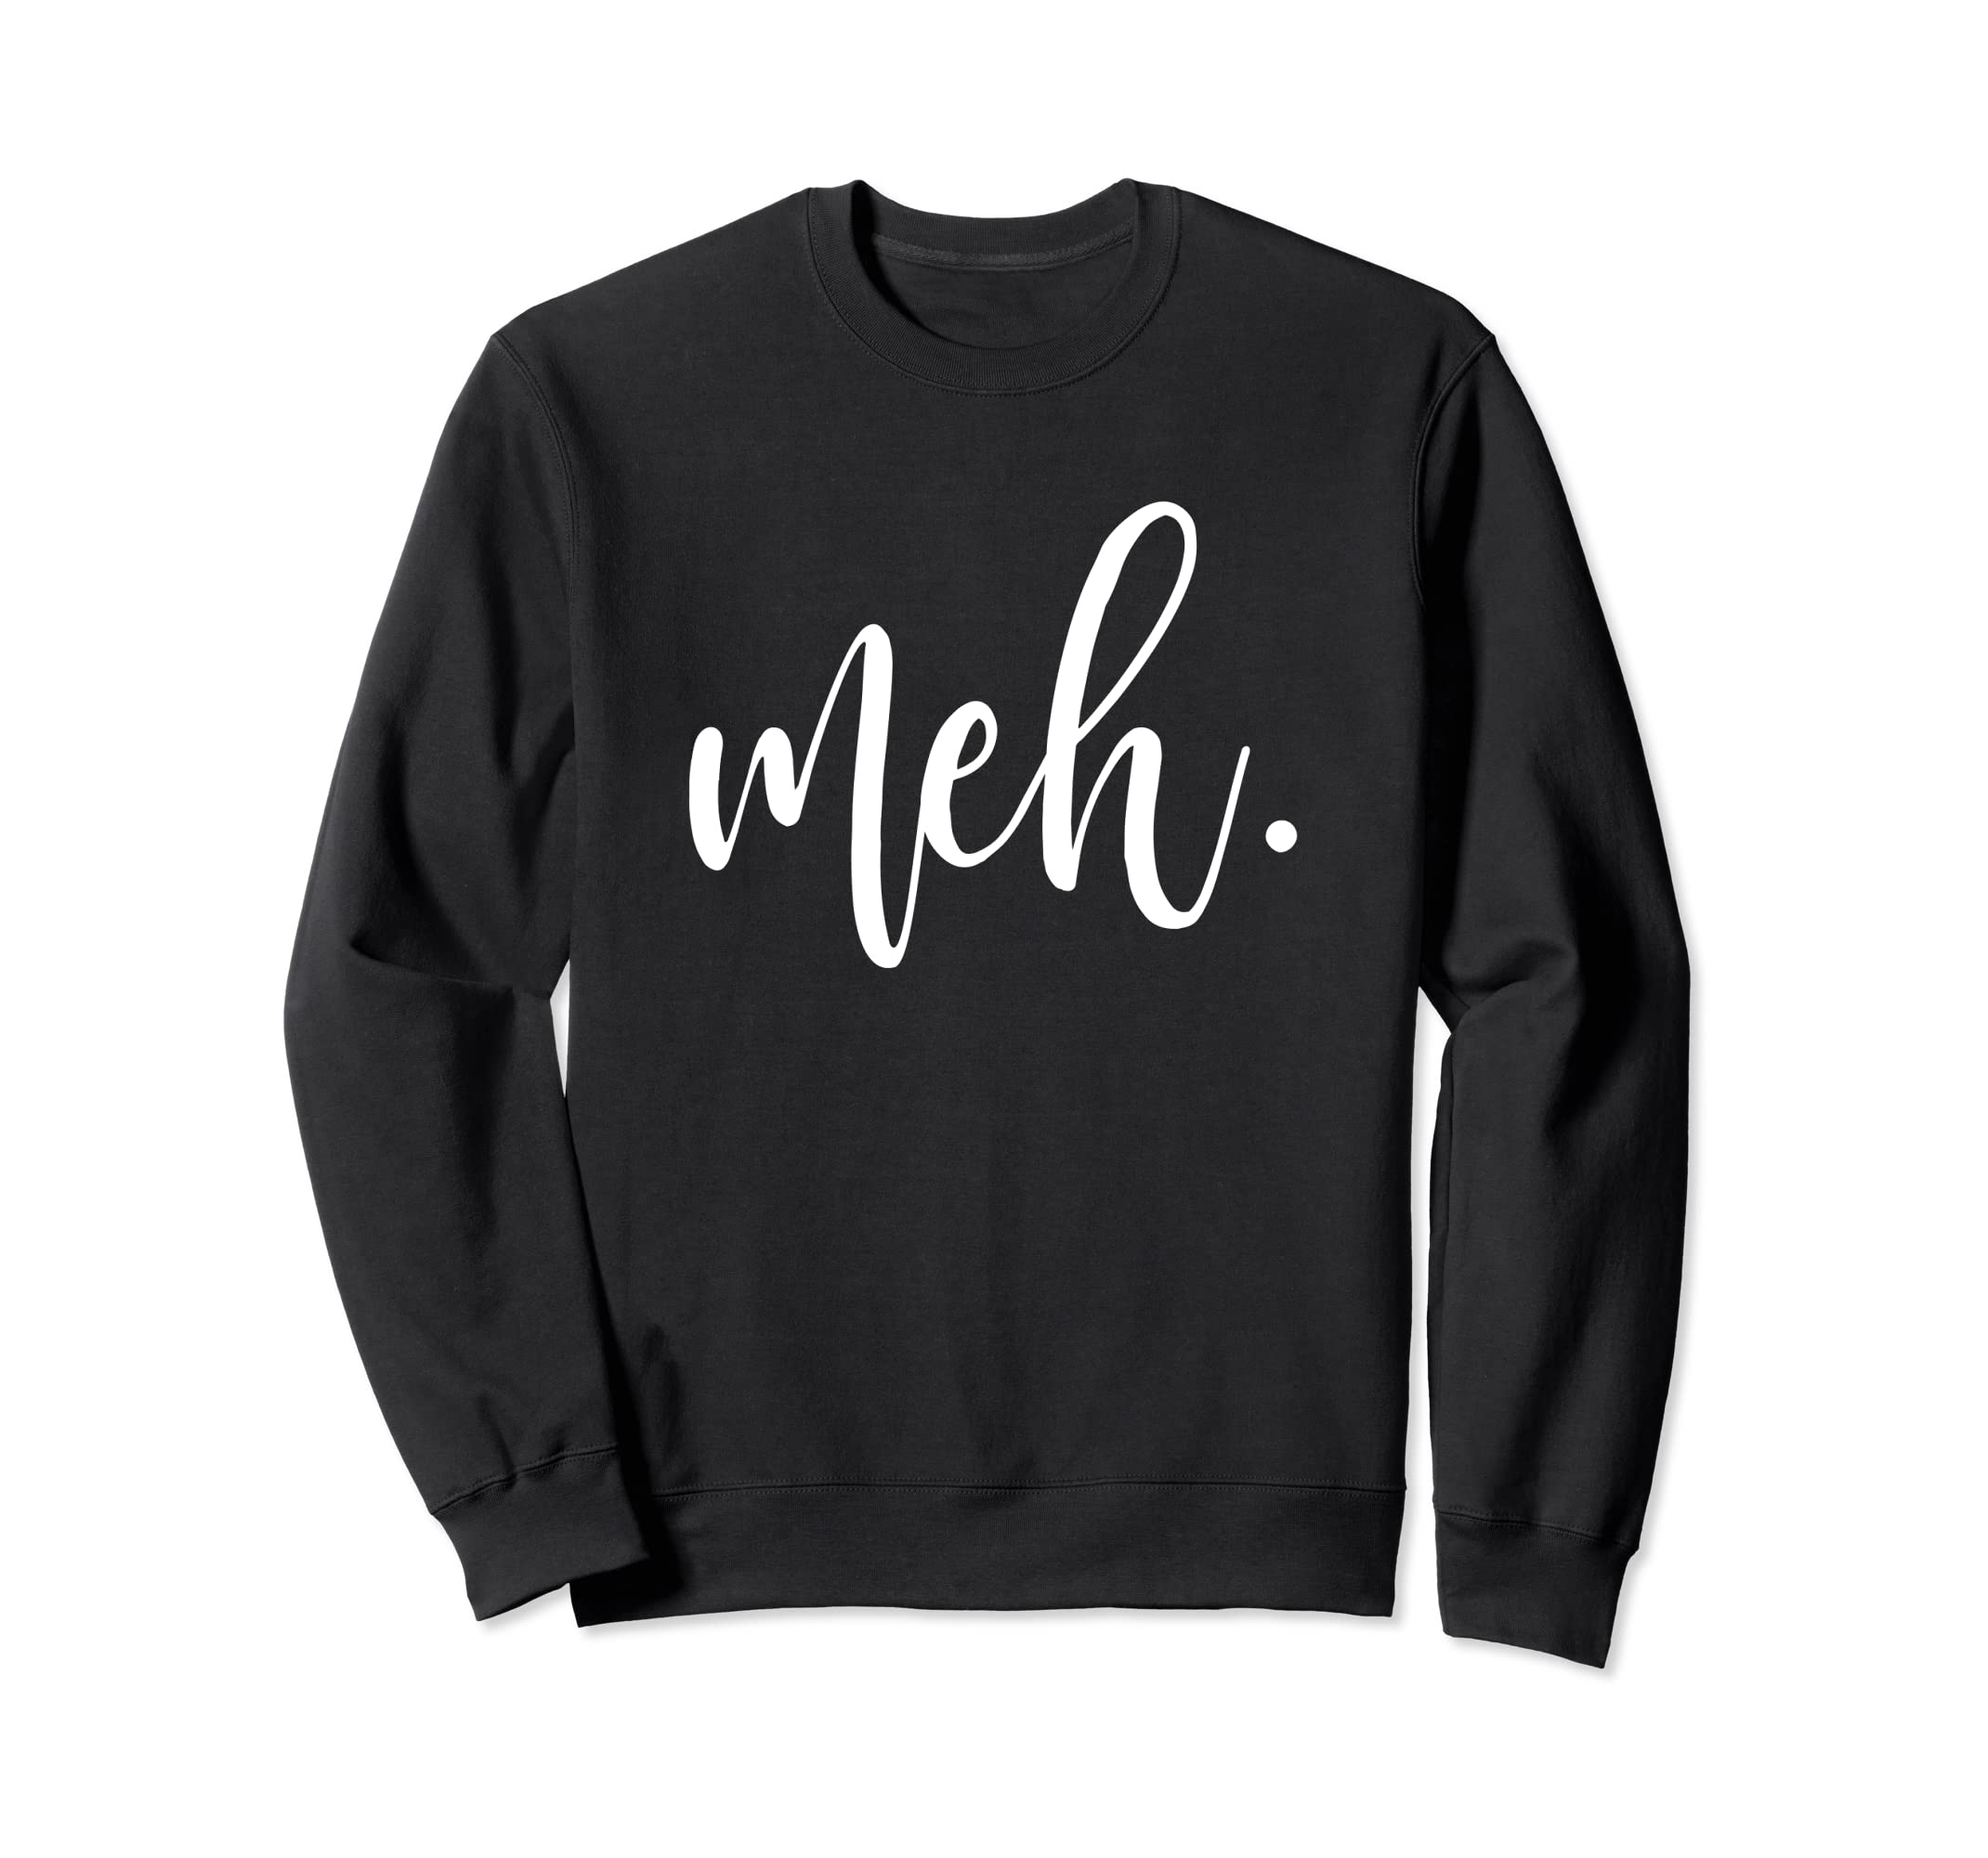 b9d8e0dc7e1 Amazon.com  Meh Sweatshirt Cute Sarcastic Sweatshirt Script Girly  Clothing